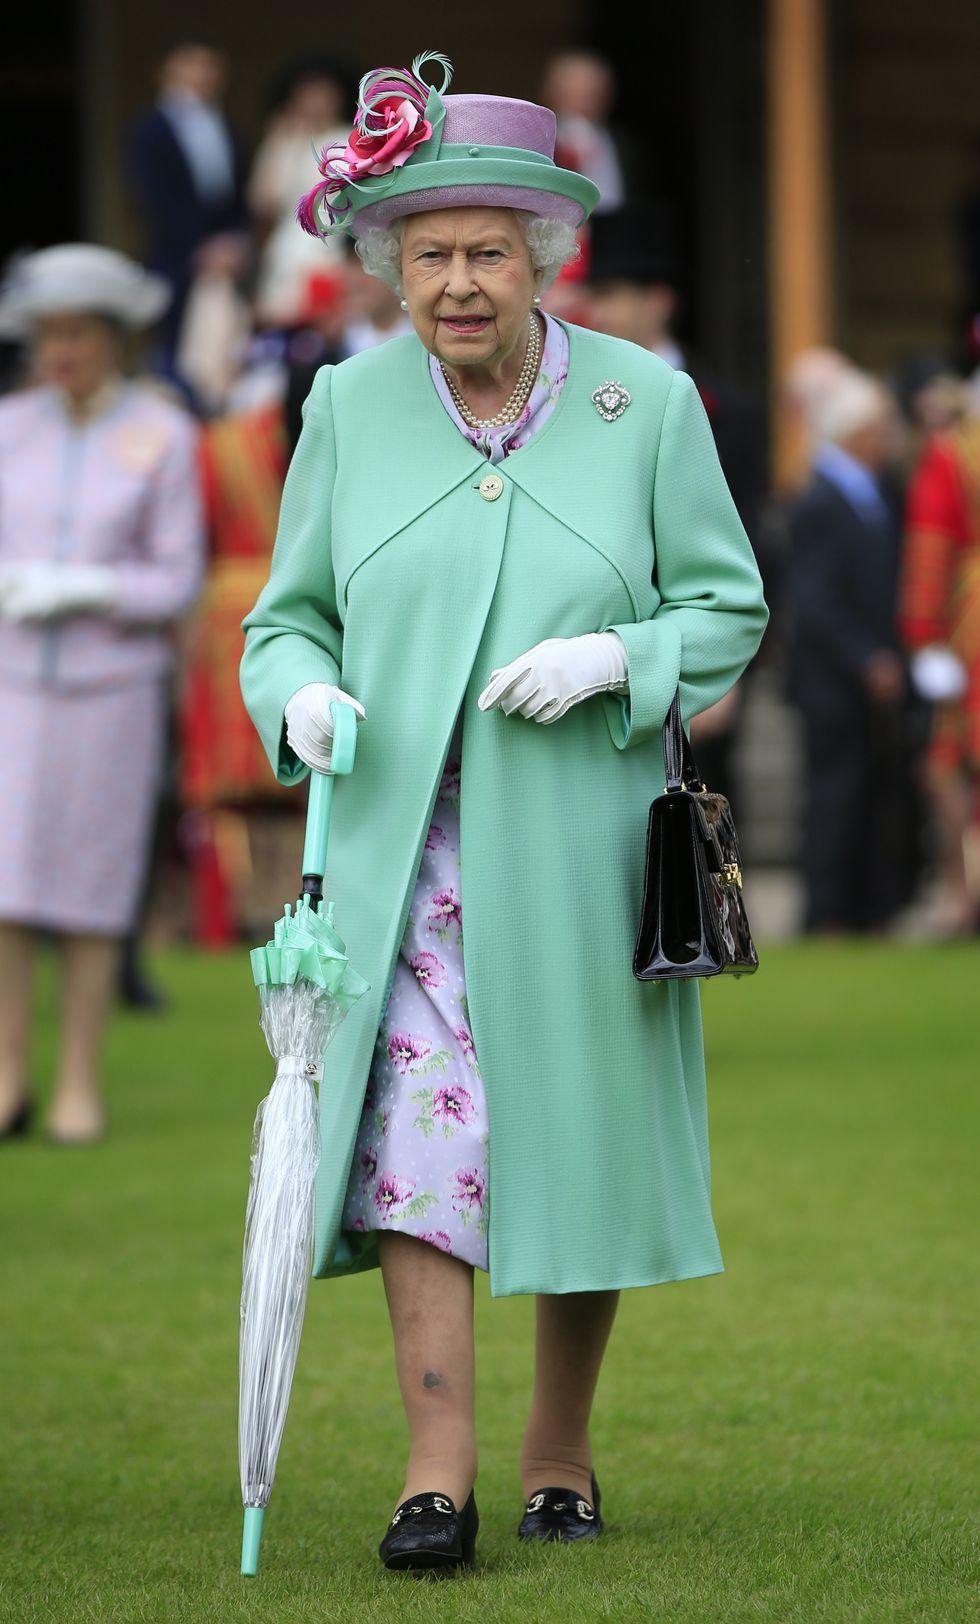 Queen Elizabeth Ii S Most Classic Looks Of All Time Moda Sapka [ 1624 x 980 Pixel ]